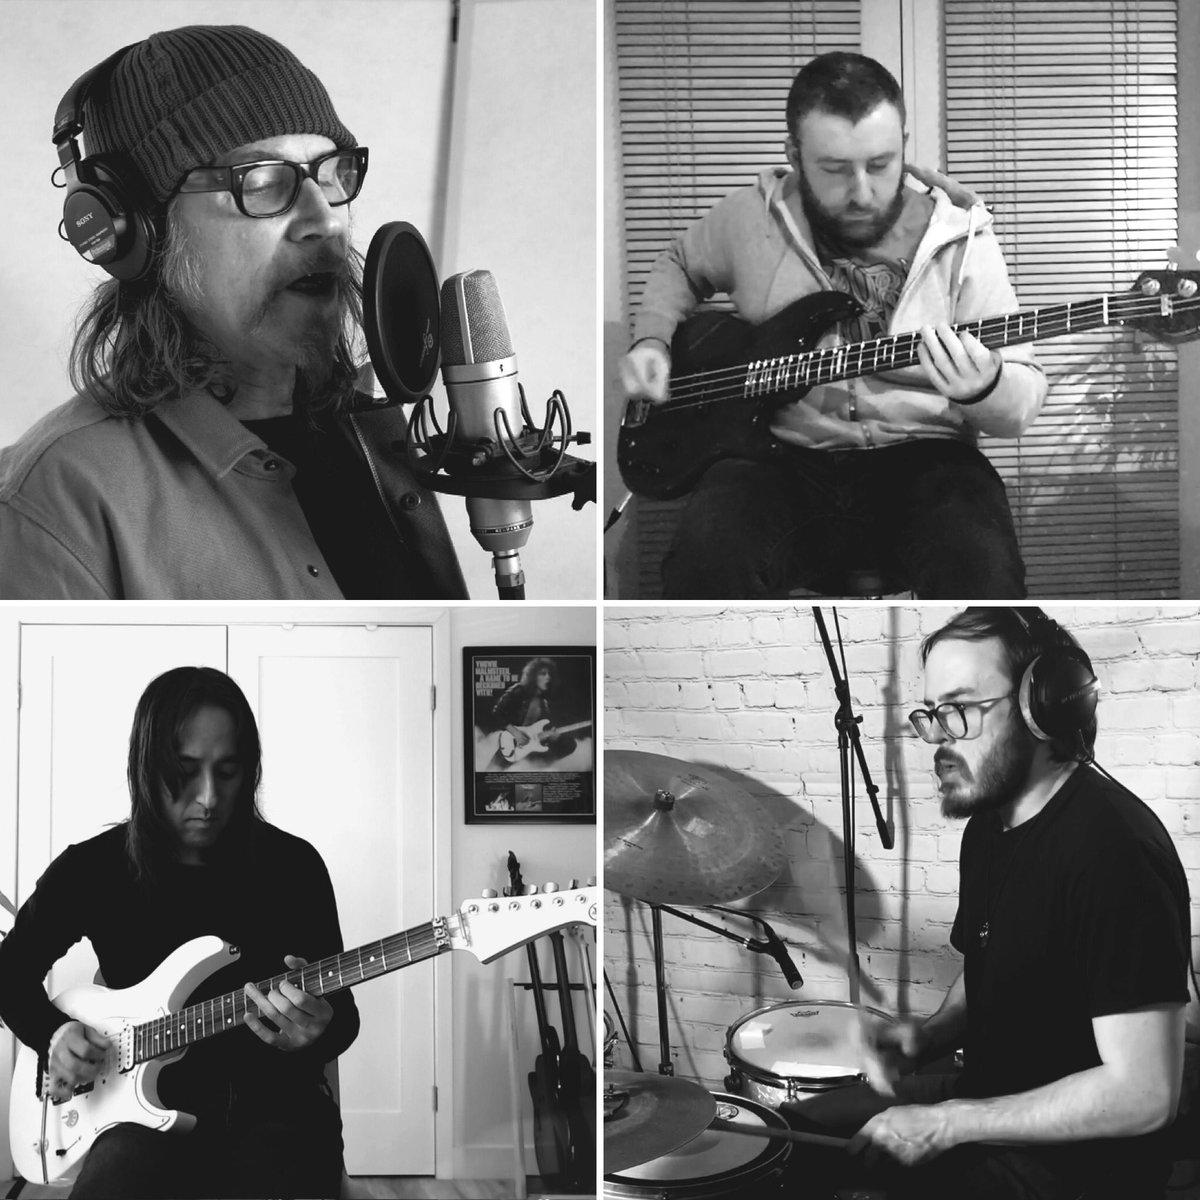 News – Mark Lanegan, Jack Bates, Jeff Schroeder & Shane Graham – Disorder (Joy Division cover)